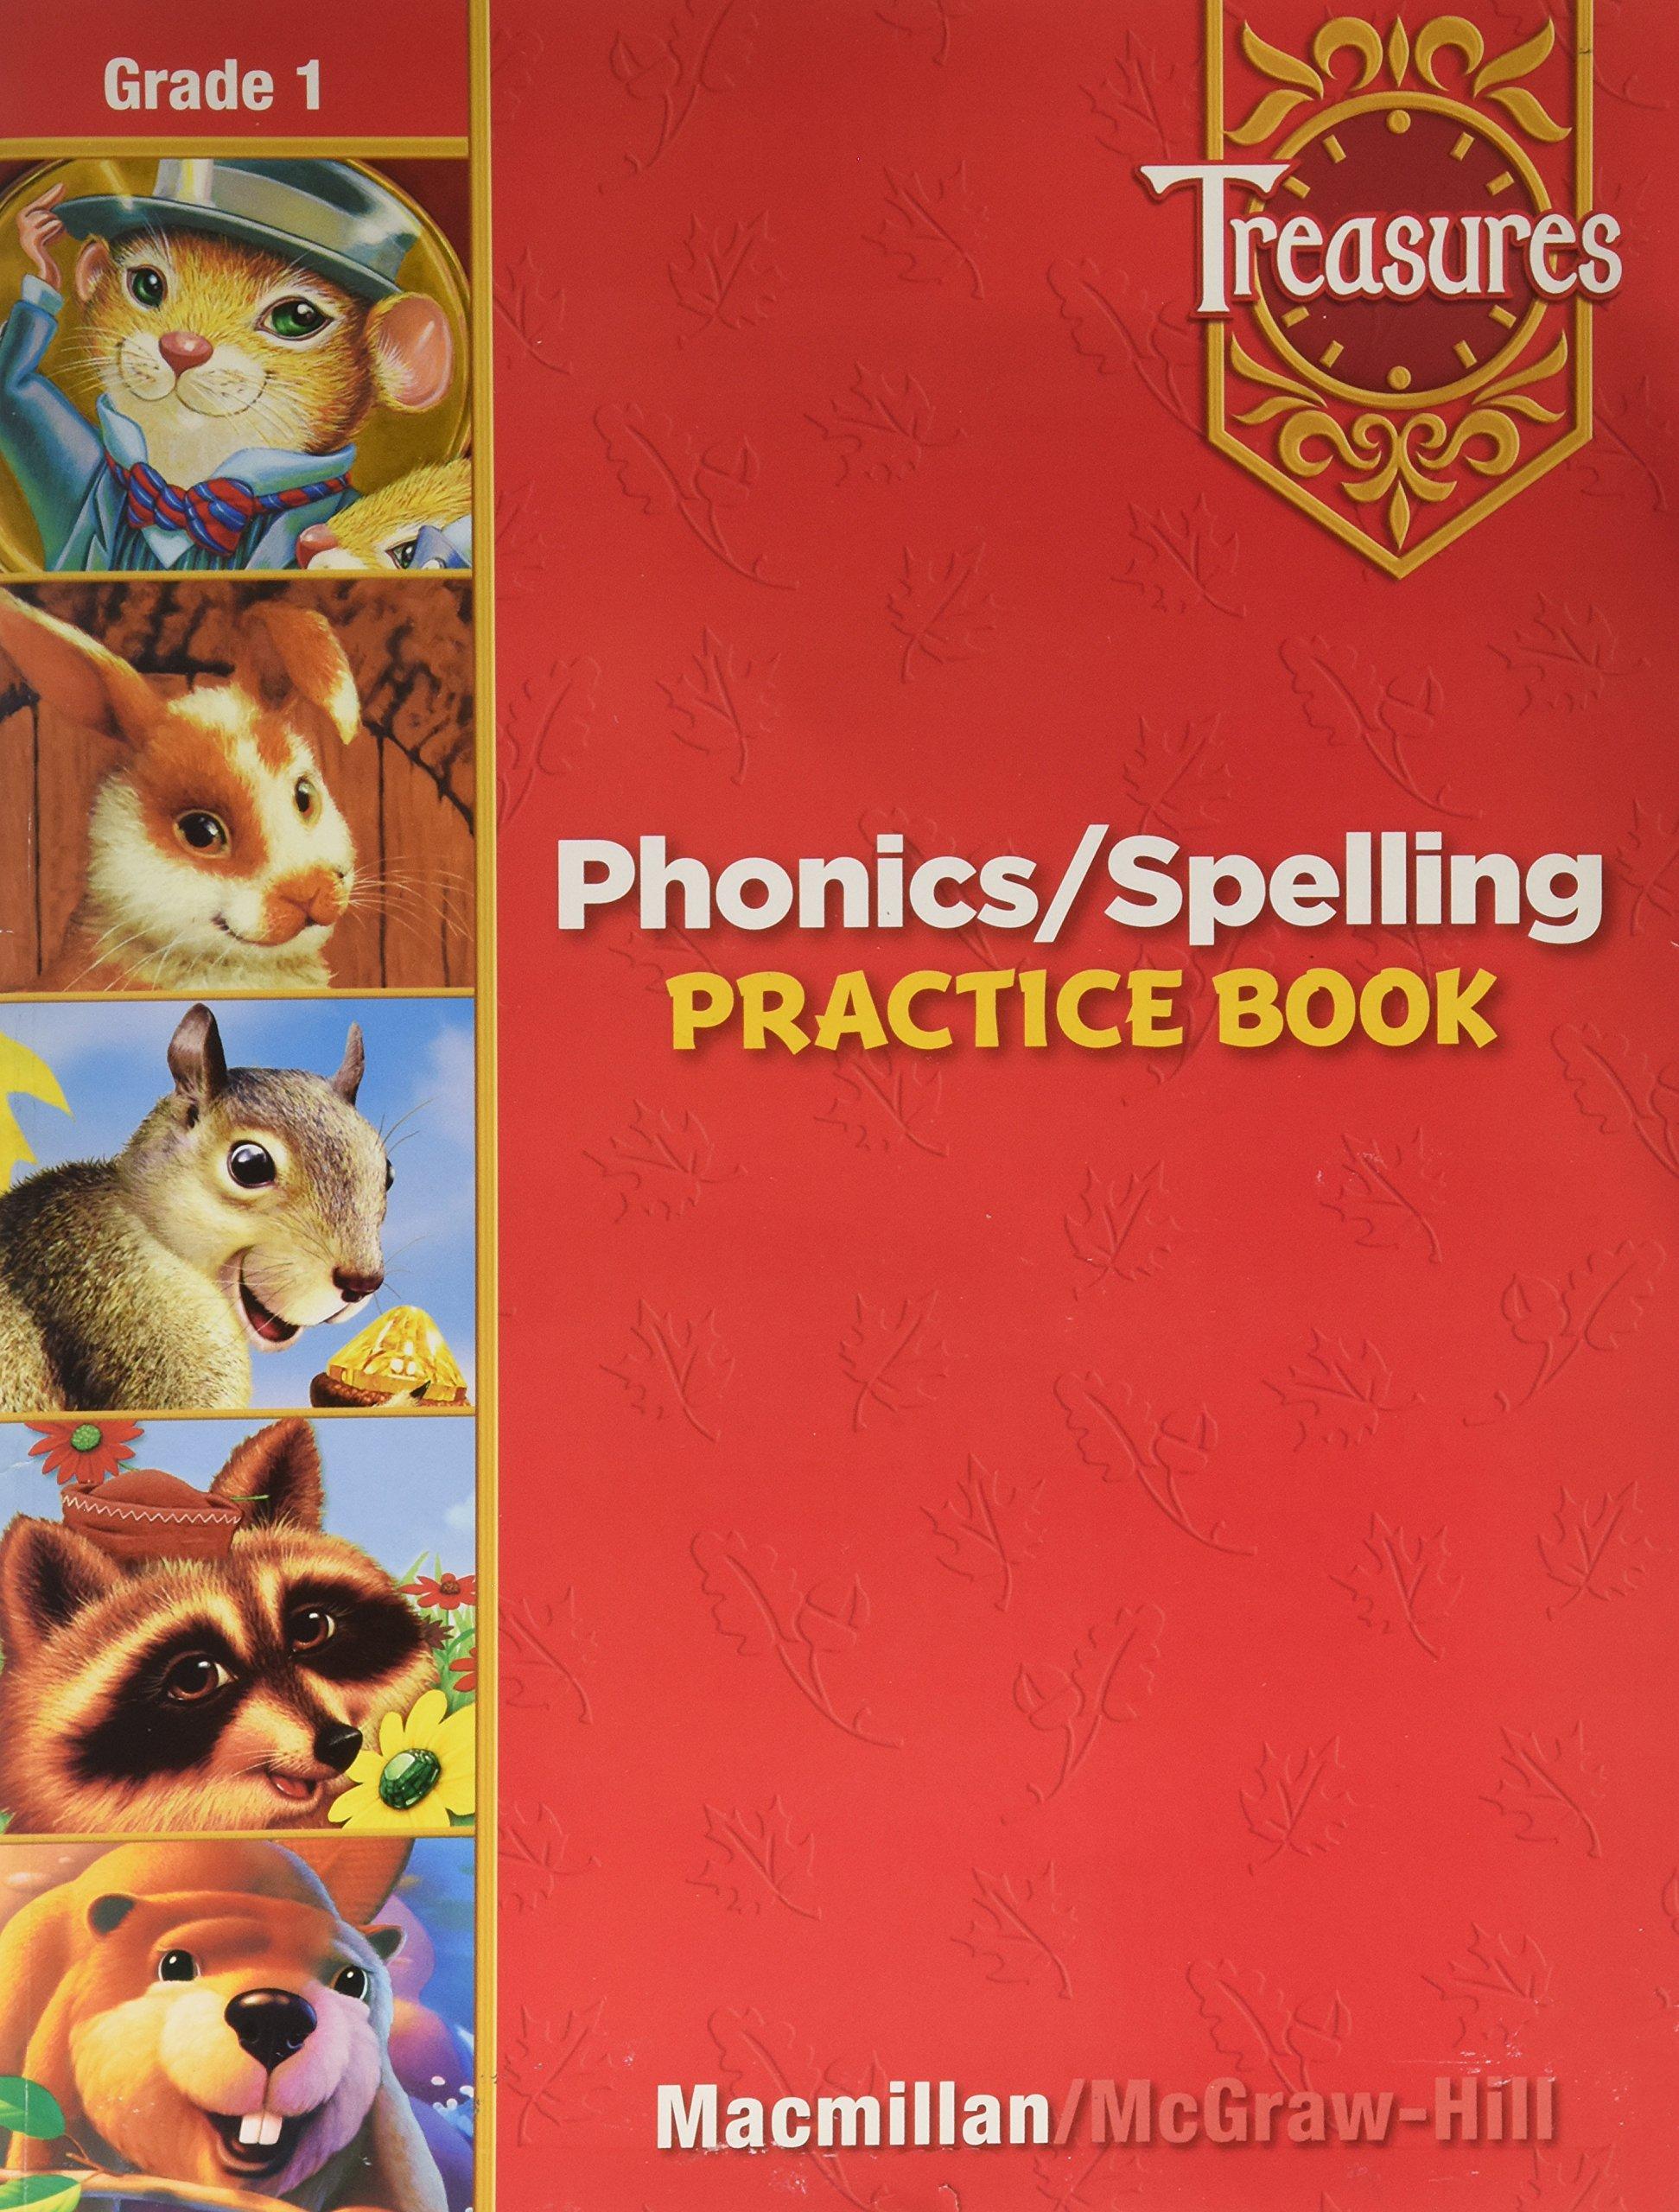 Download Phonics / Spelling Practice Book, Grade 1 (Treasures) ePub fb2 book